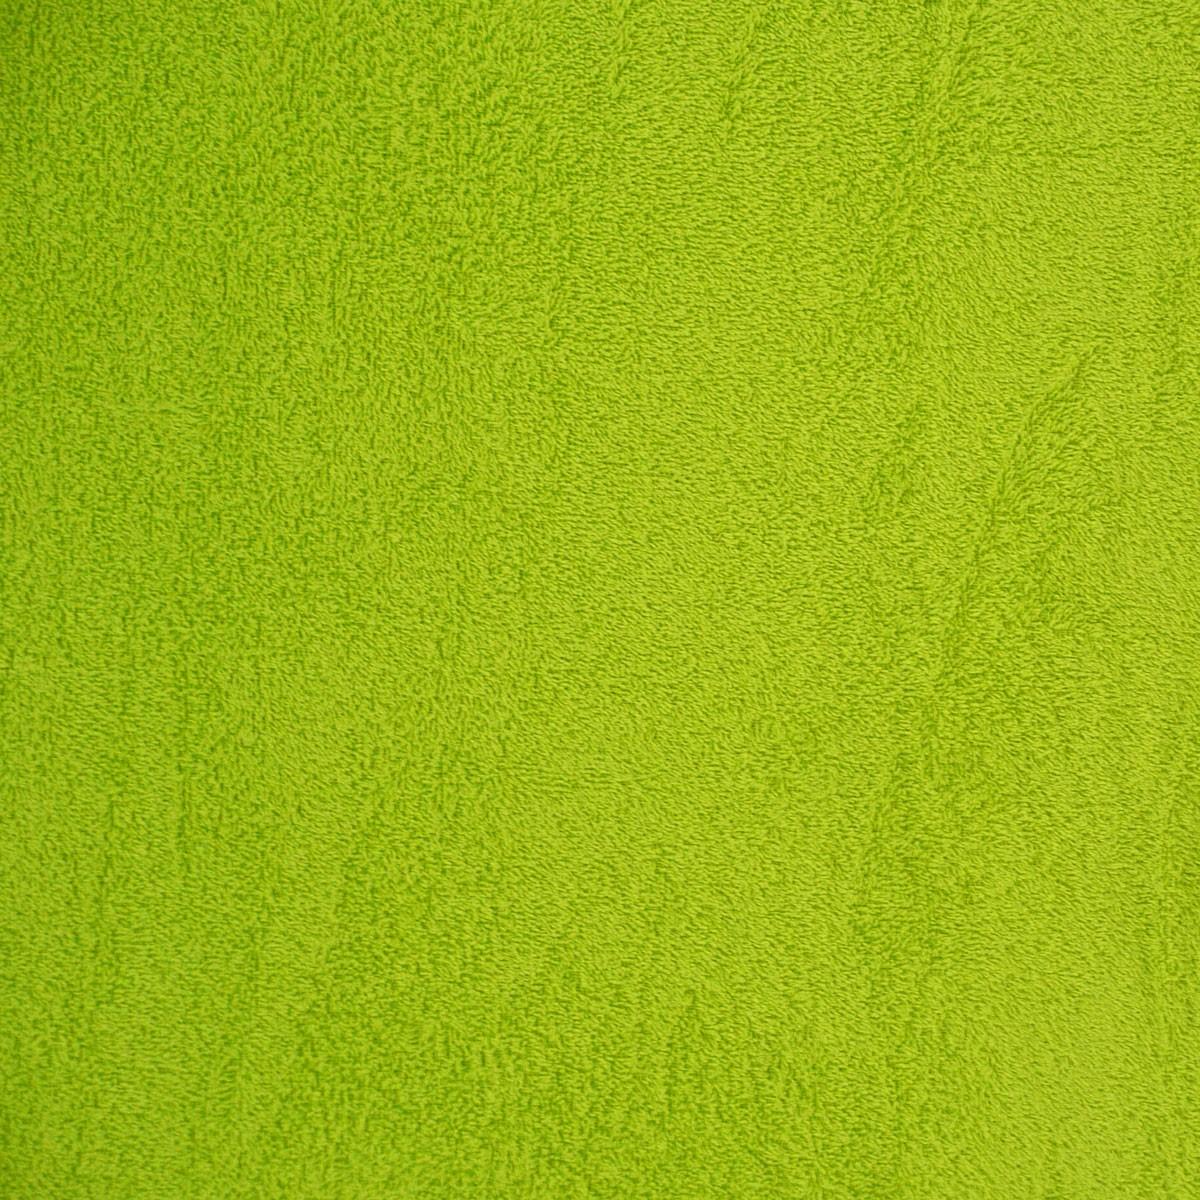 frottee handtuch stoff apfelgr n alle stoffe stoffe uni baumwollmischungen. Black Bedroom Furniture Sets. Home Design Ideas